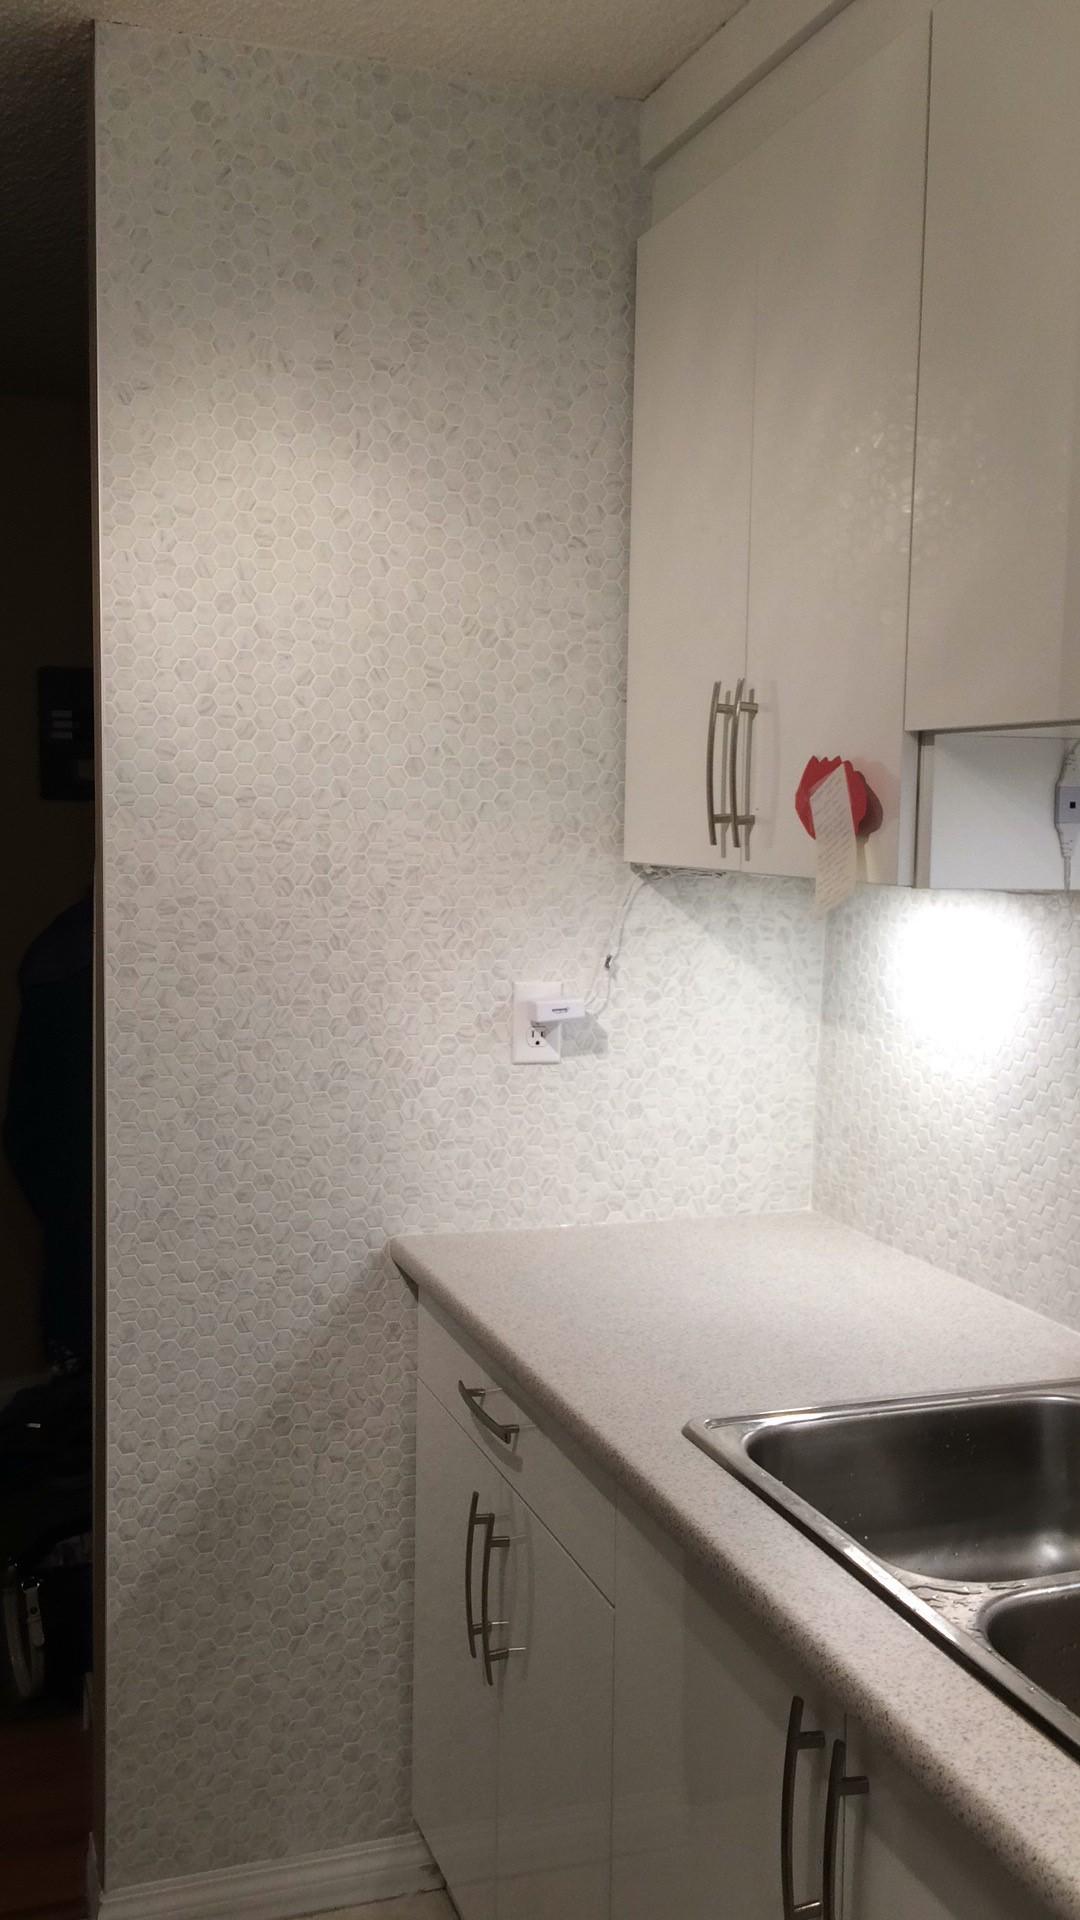 Kitchen splash replacement (after)